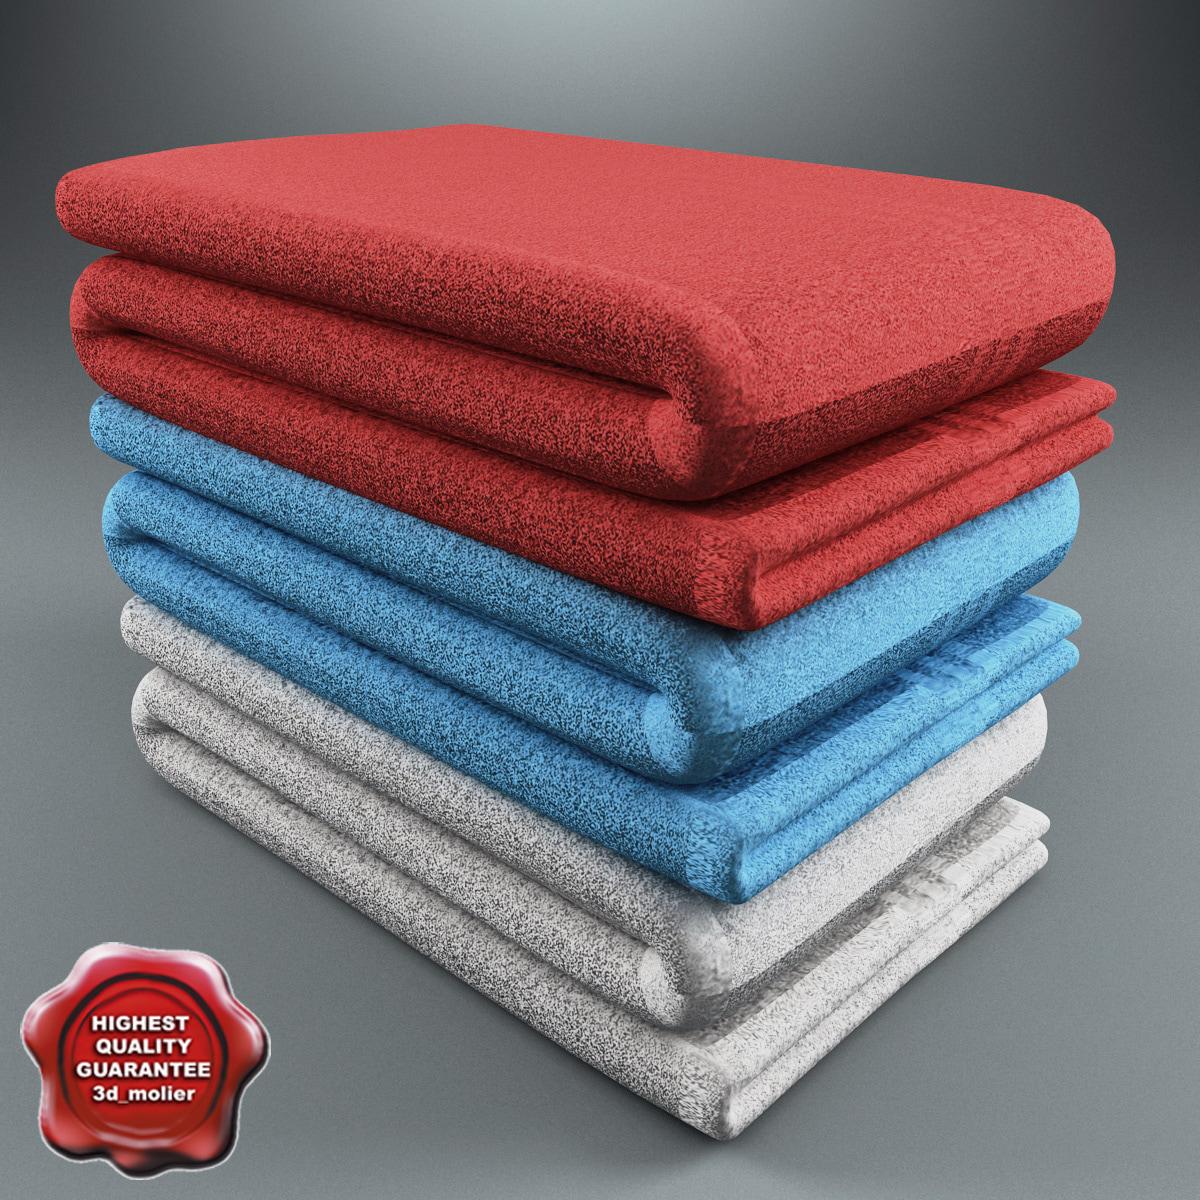 Bath_Towels_V1_00.jpg